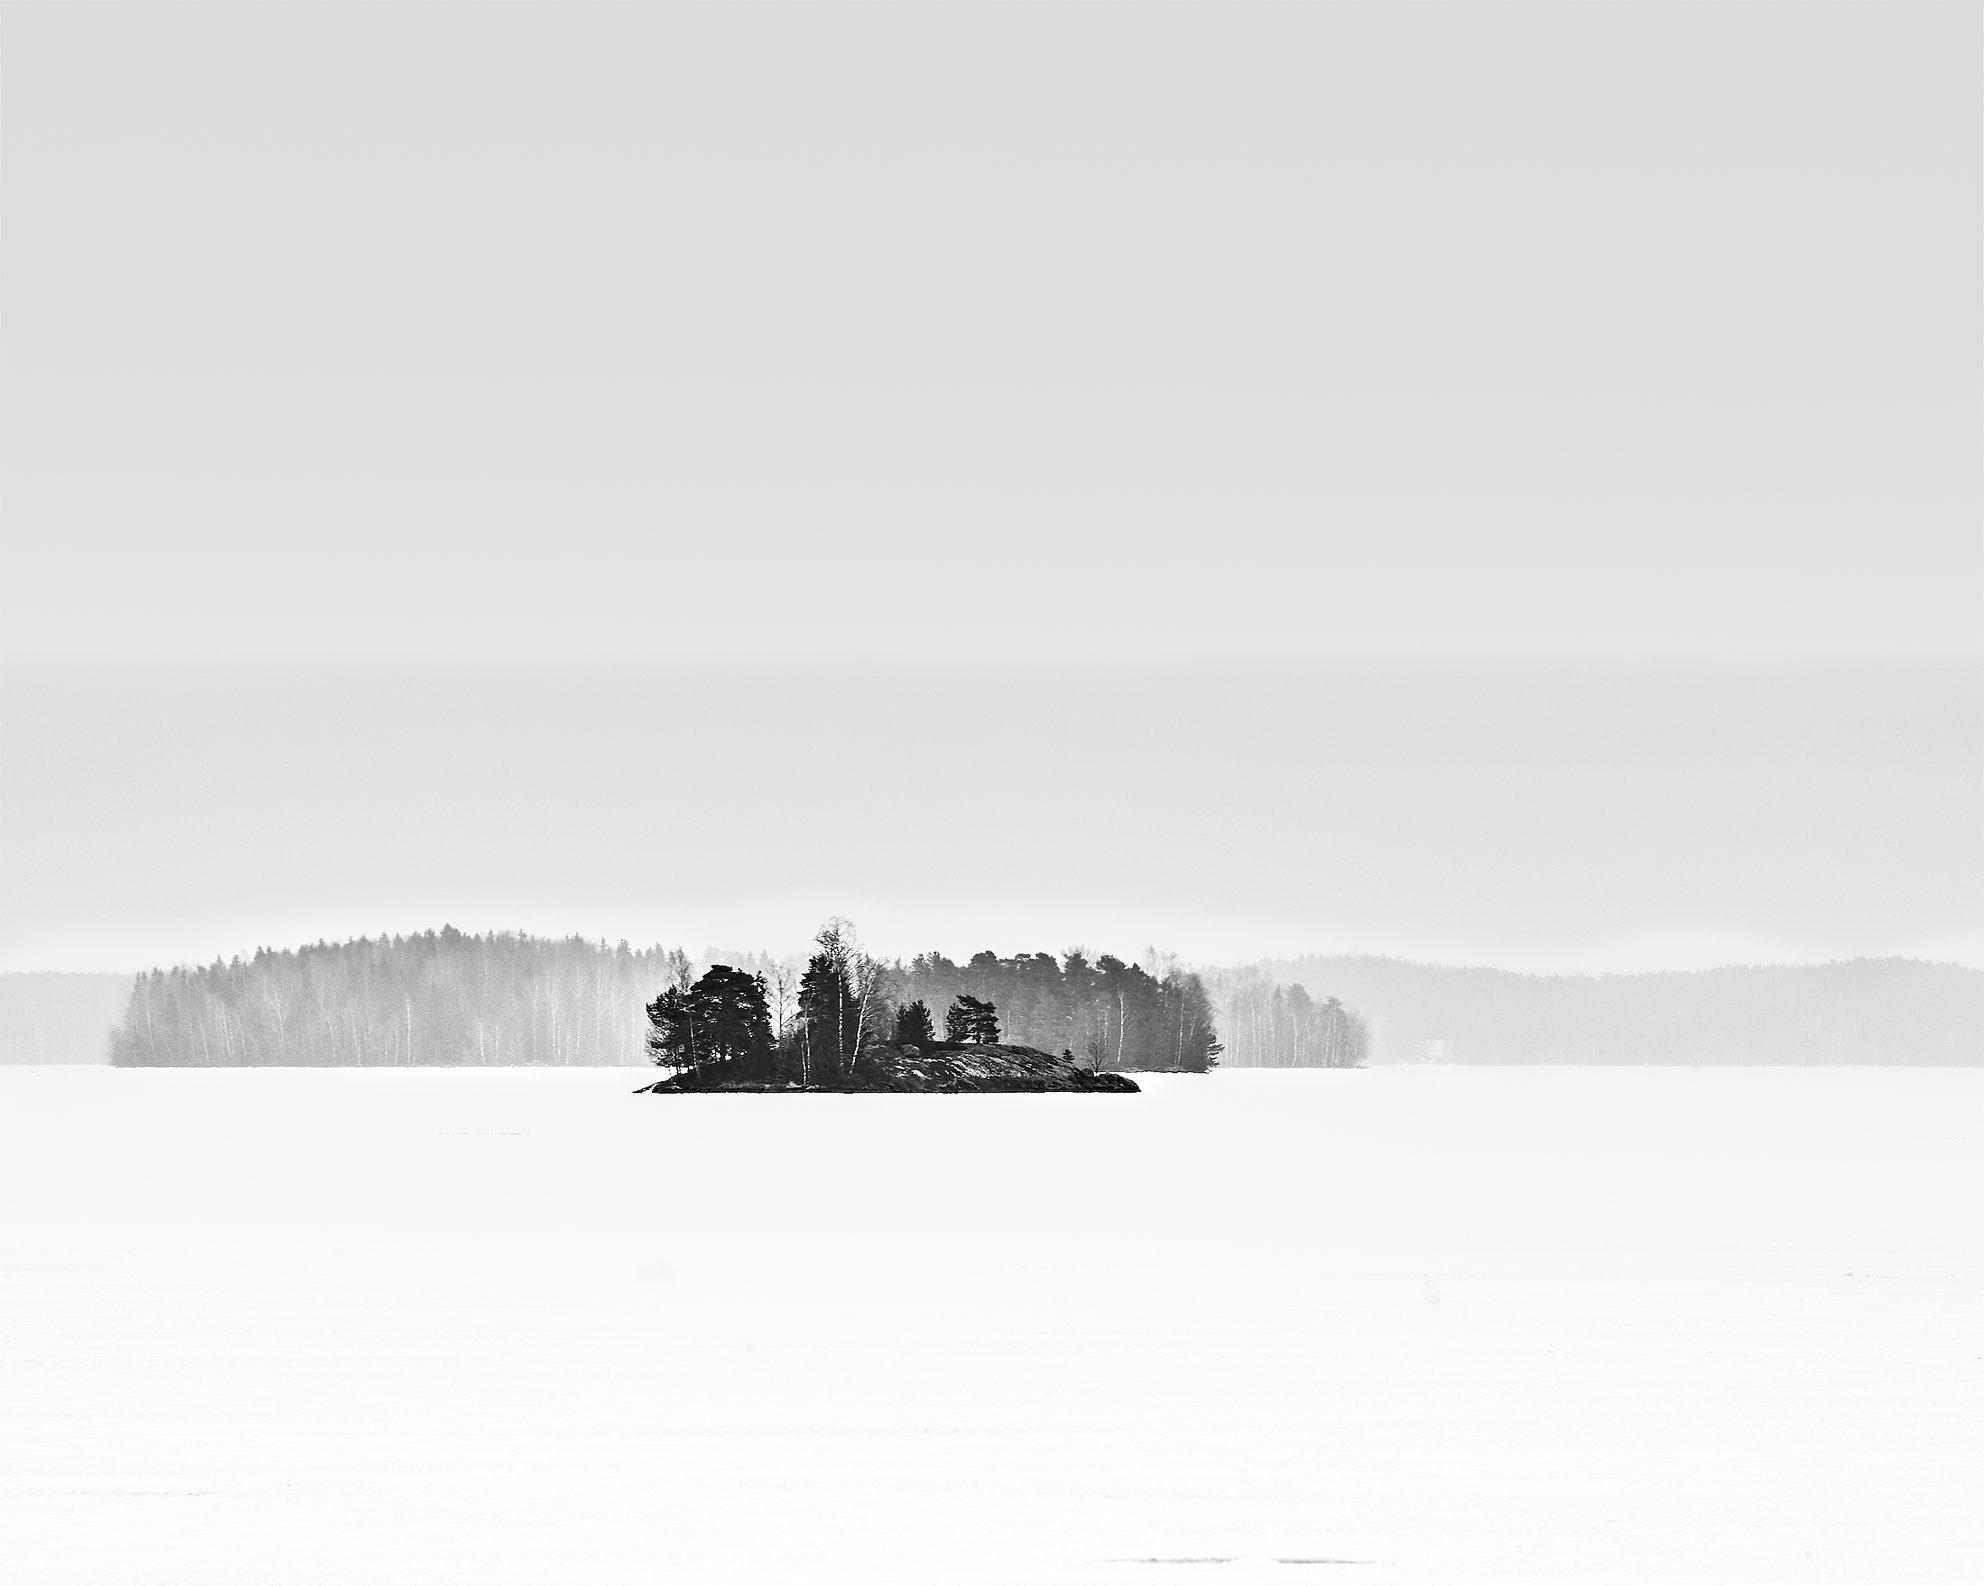 2017-03-25-Sääksmäki-0235.jpg